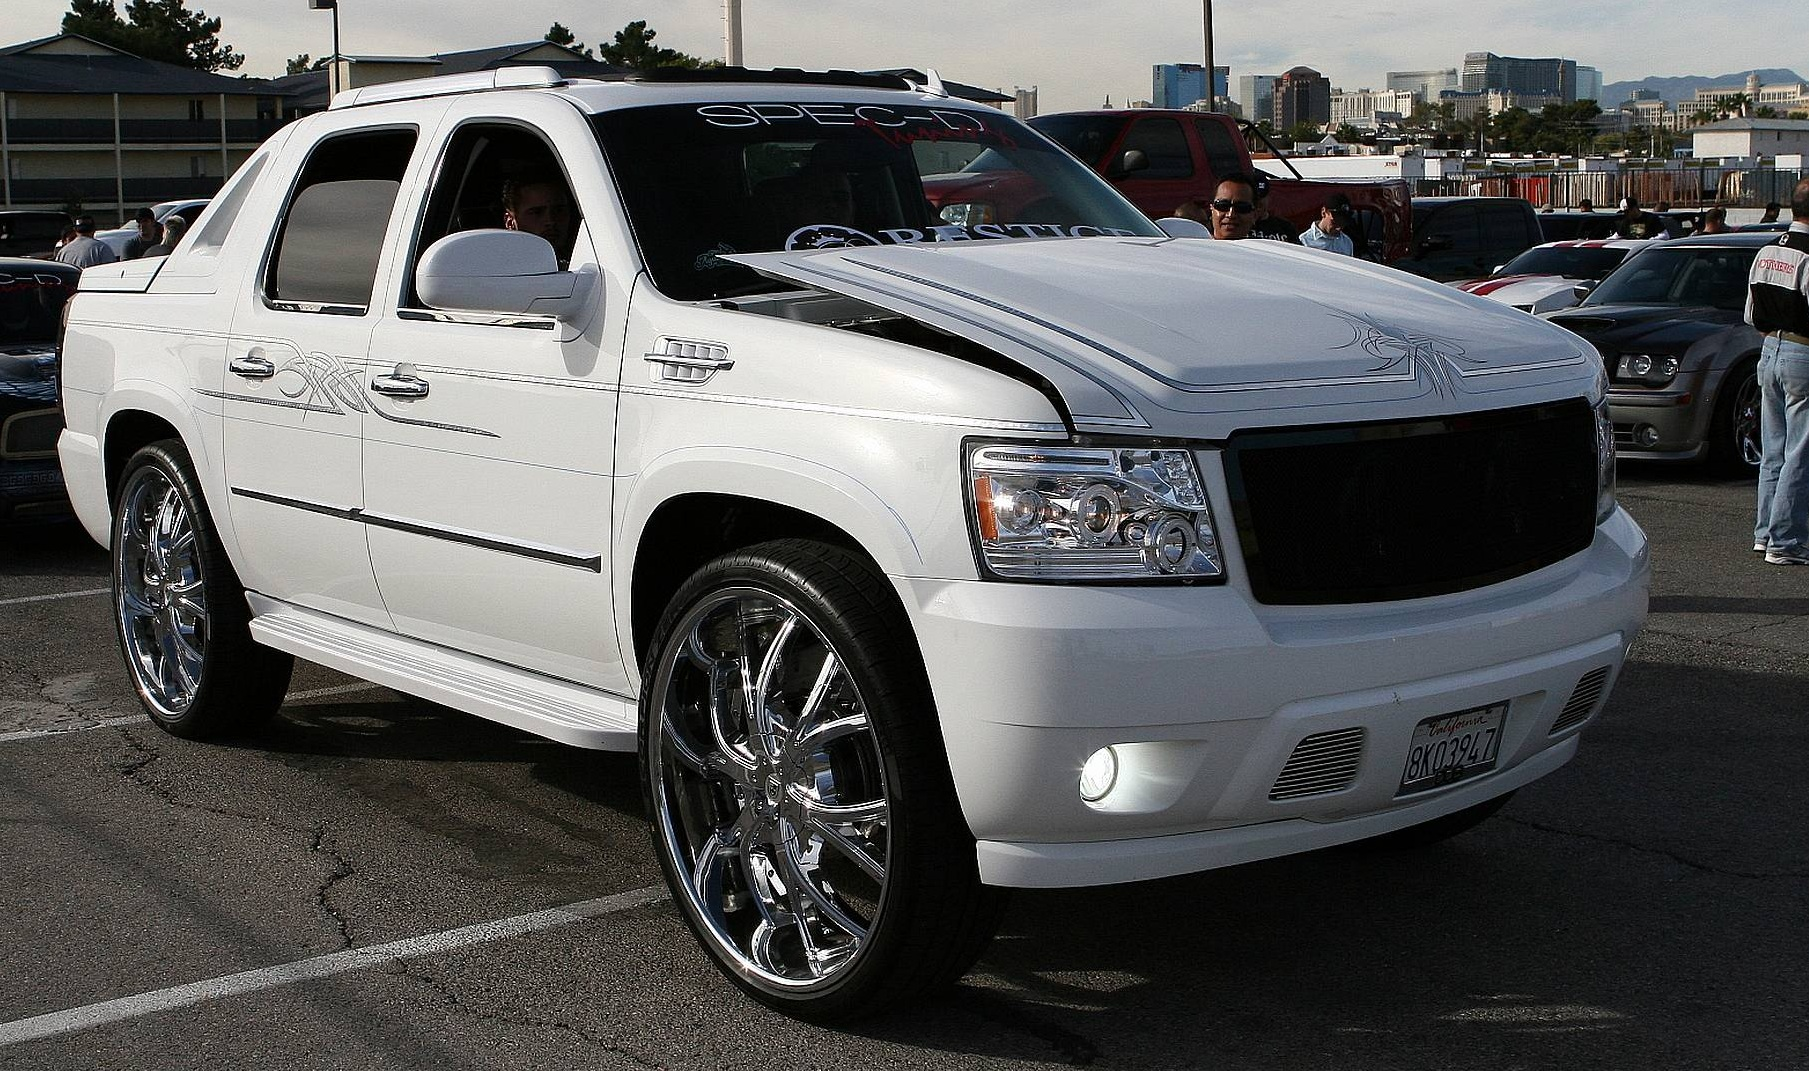 AVALANCHE Chevrolet Avalanche Custom SUV Tuning